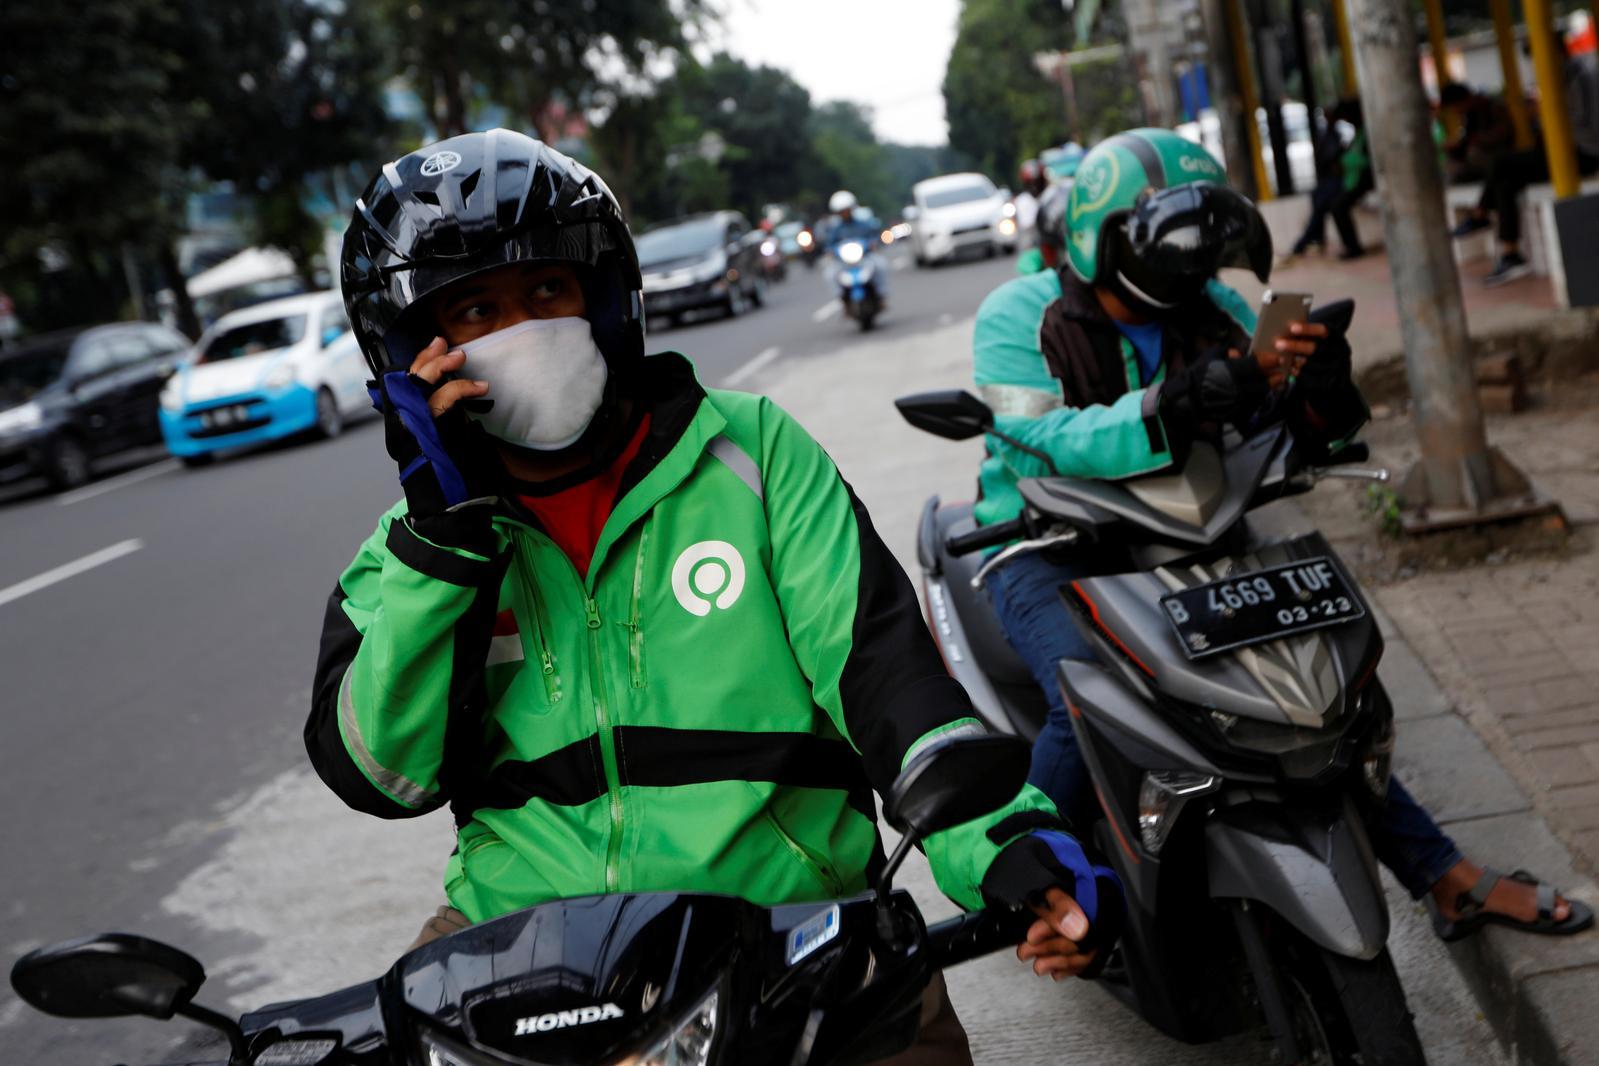 Indonesia's Gojek, Tokopedia in advanced $18 billion merger talks -sources